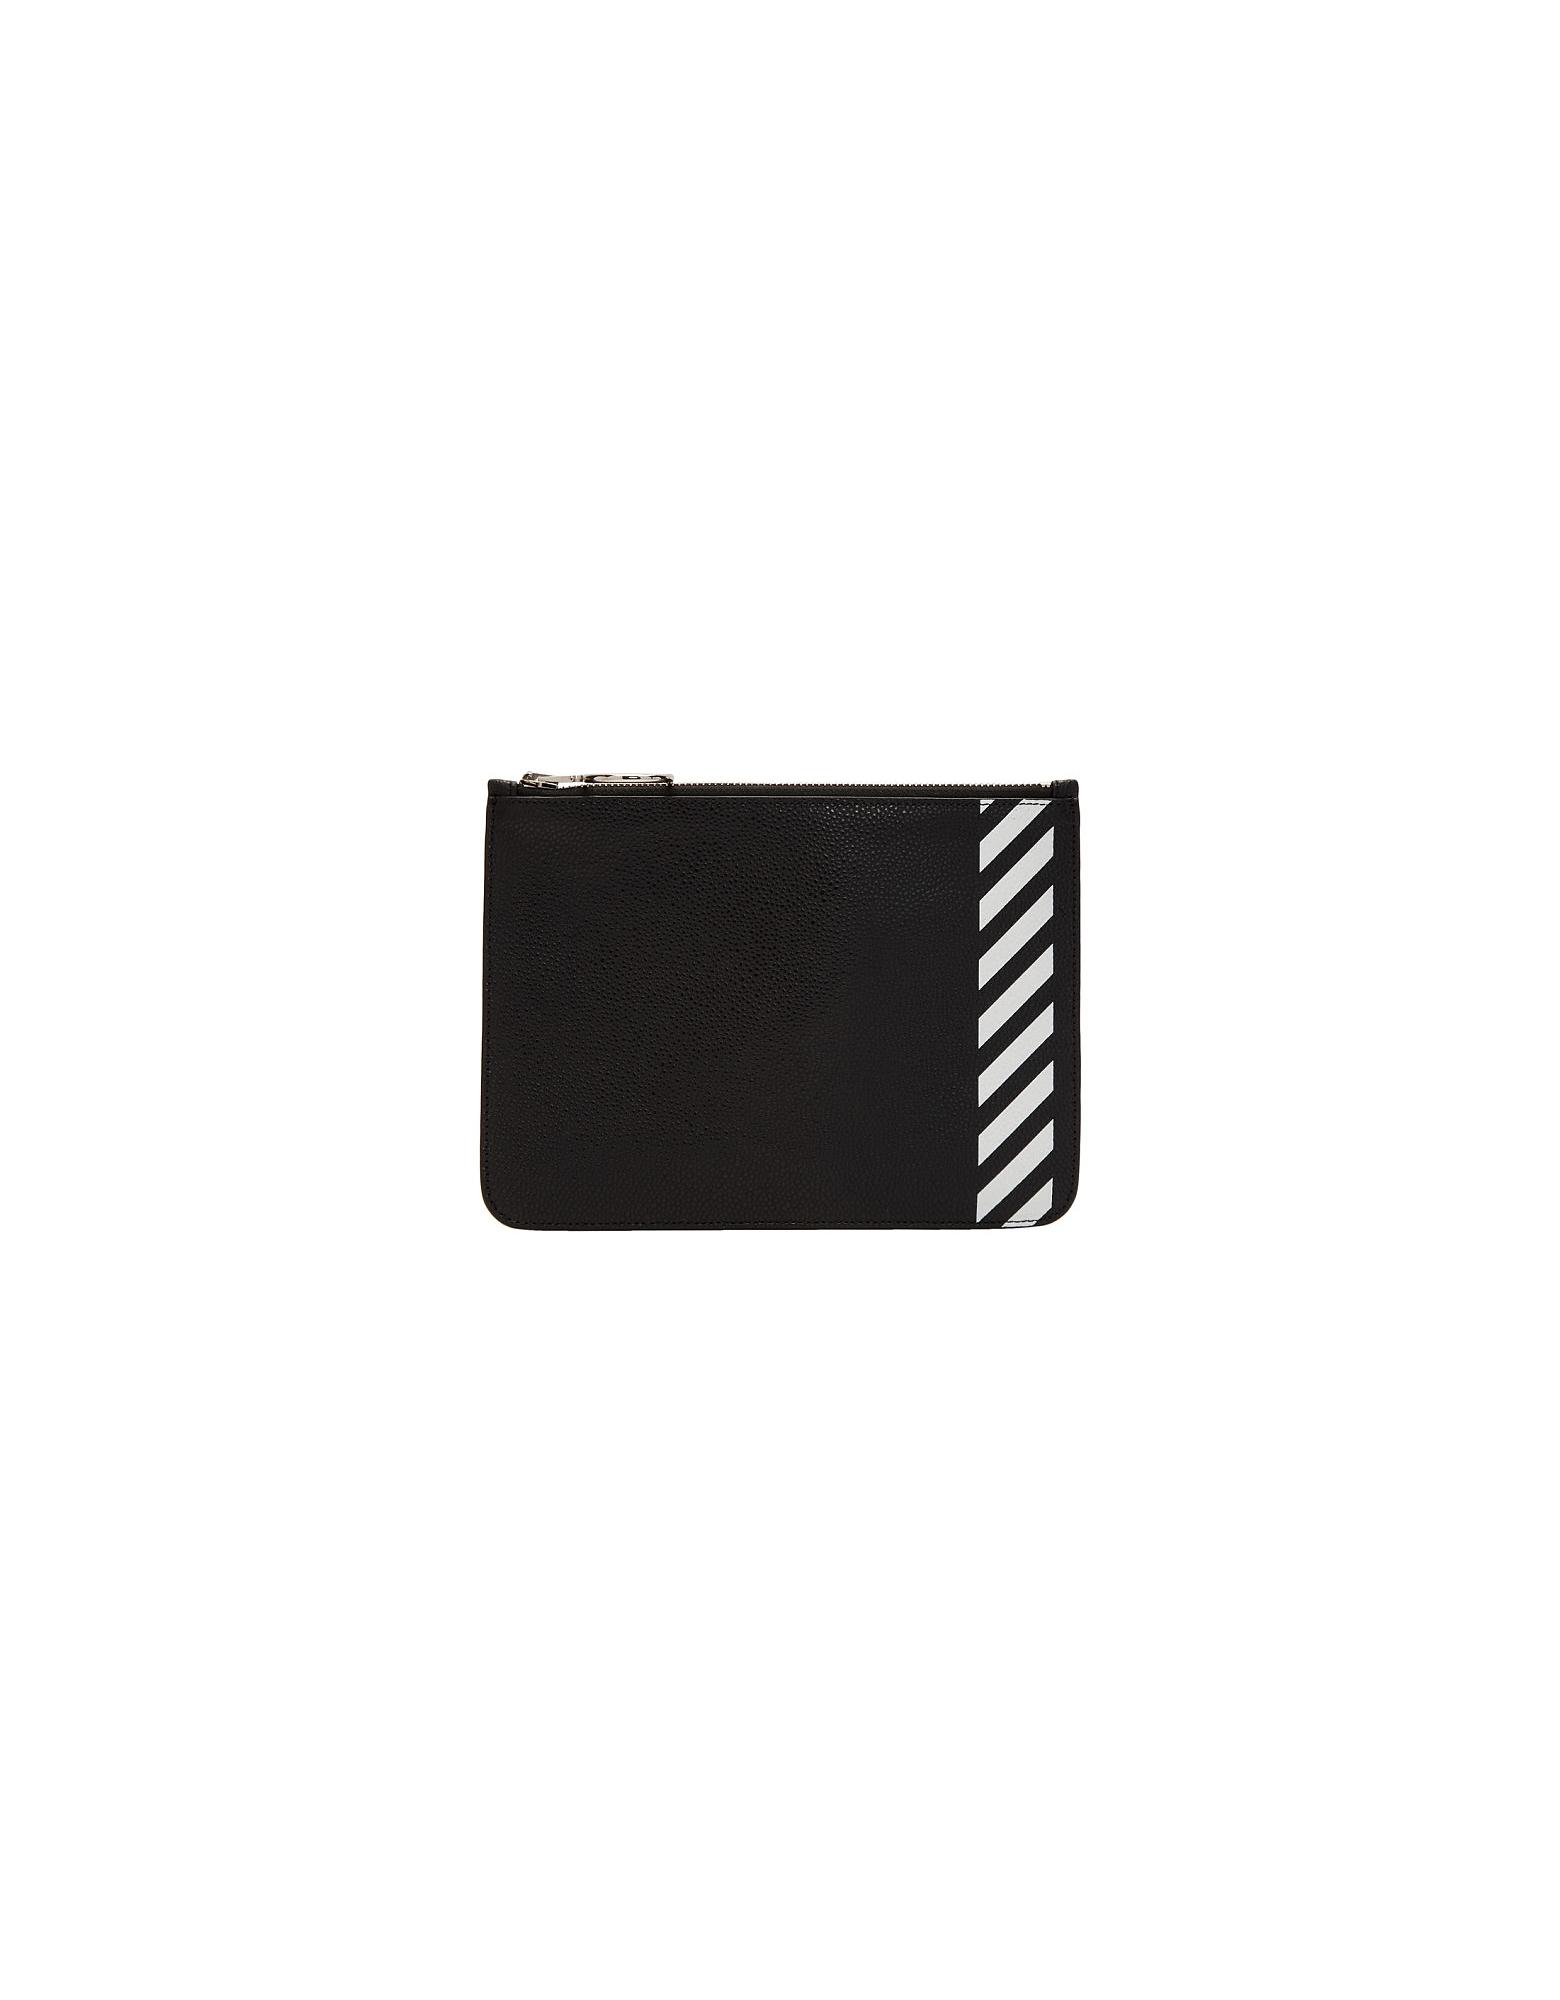 Off-White Designer Handbags, Black Diag Flat Pouch